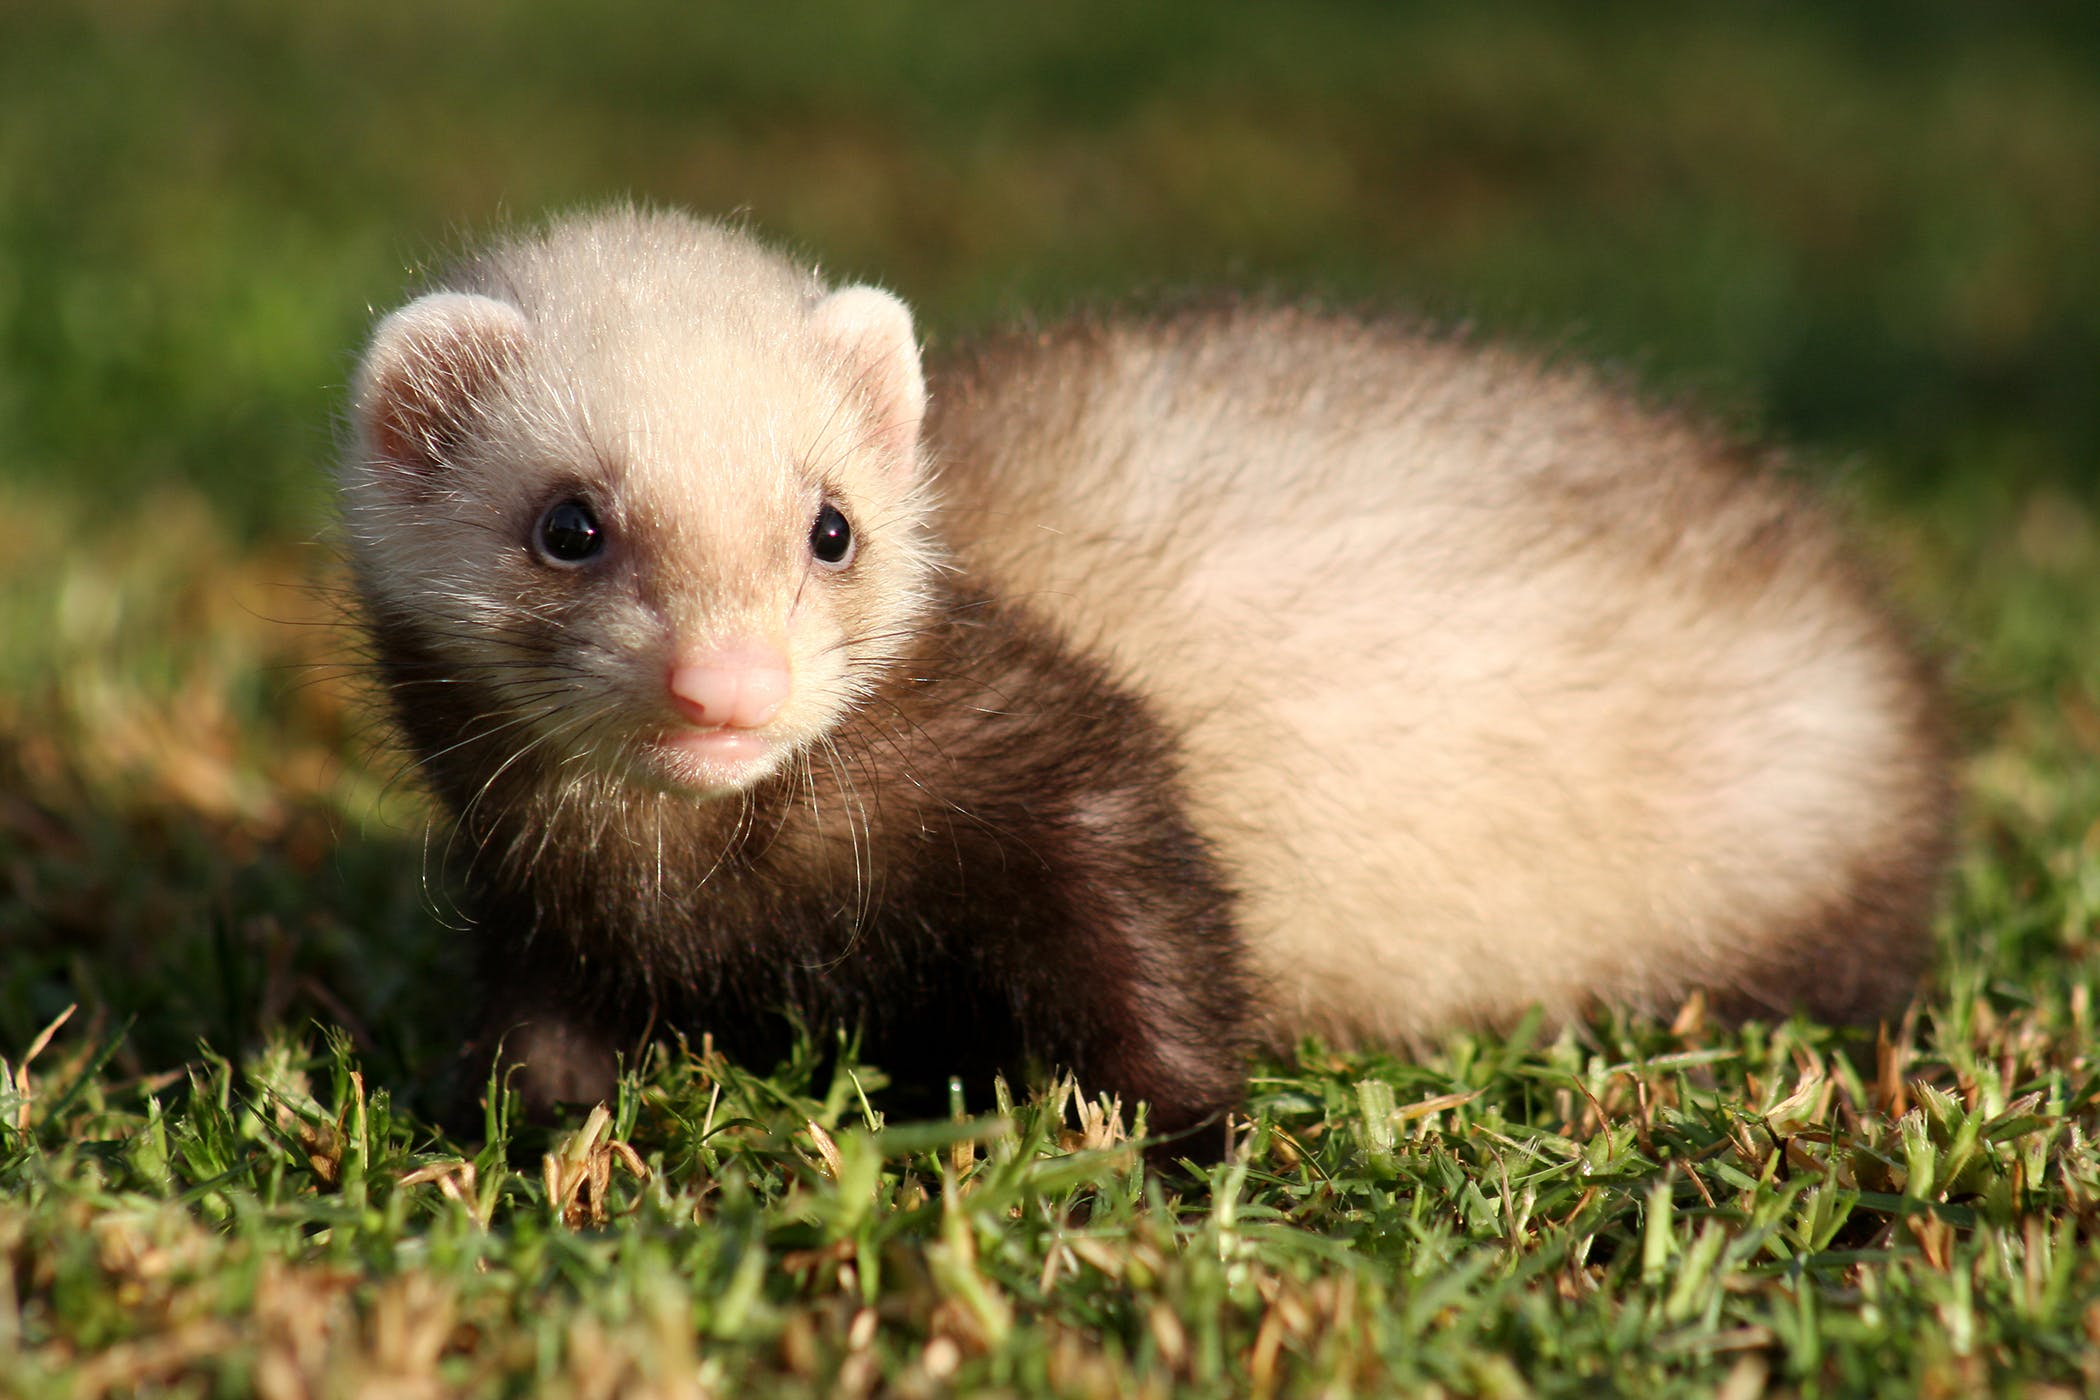 Inflammatory Bowel Disease in Ferrets